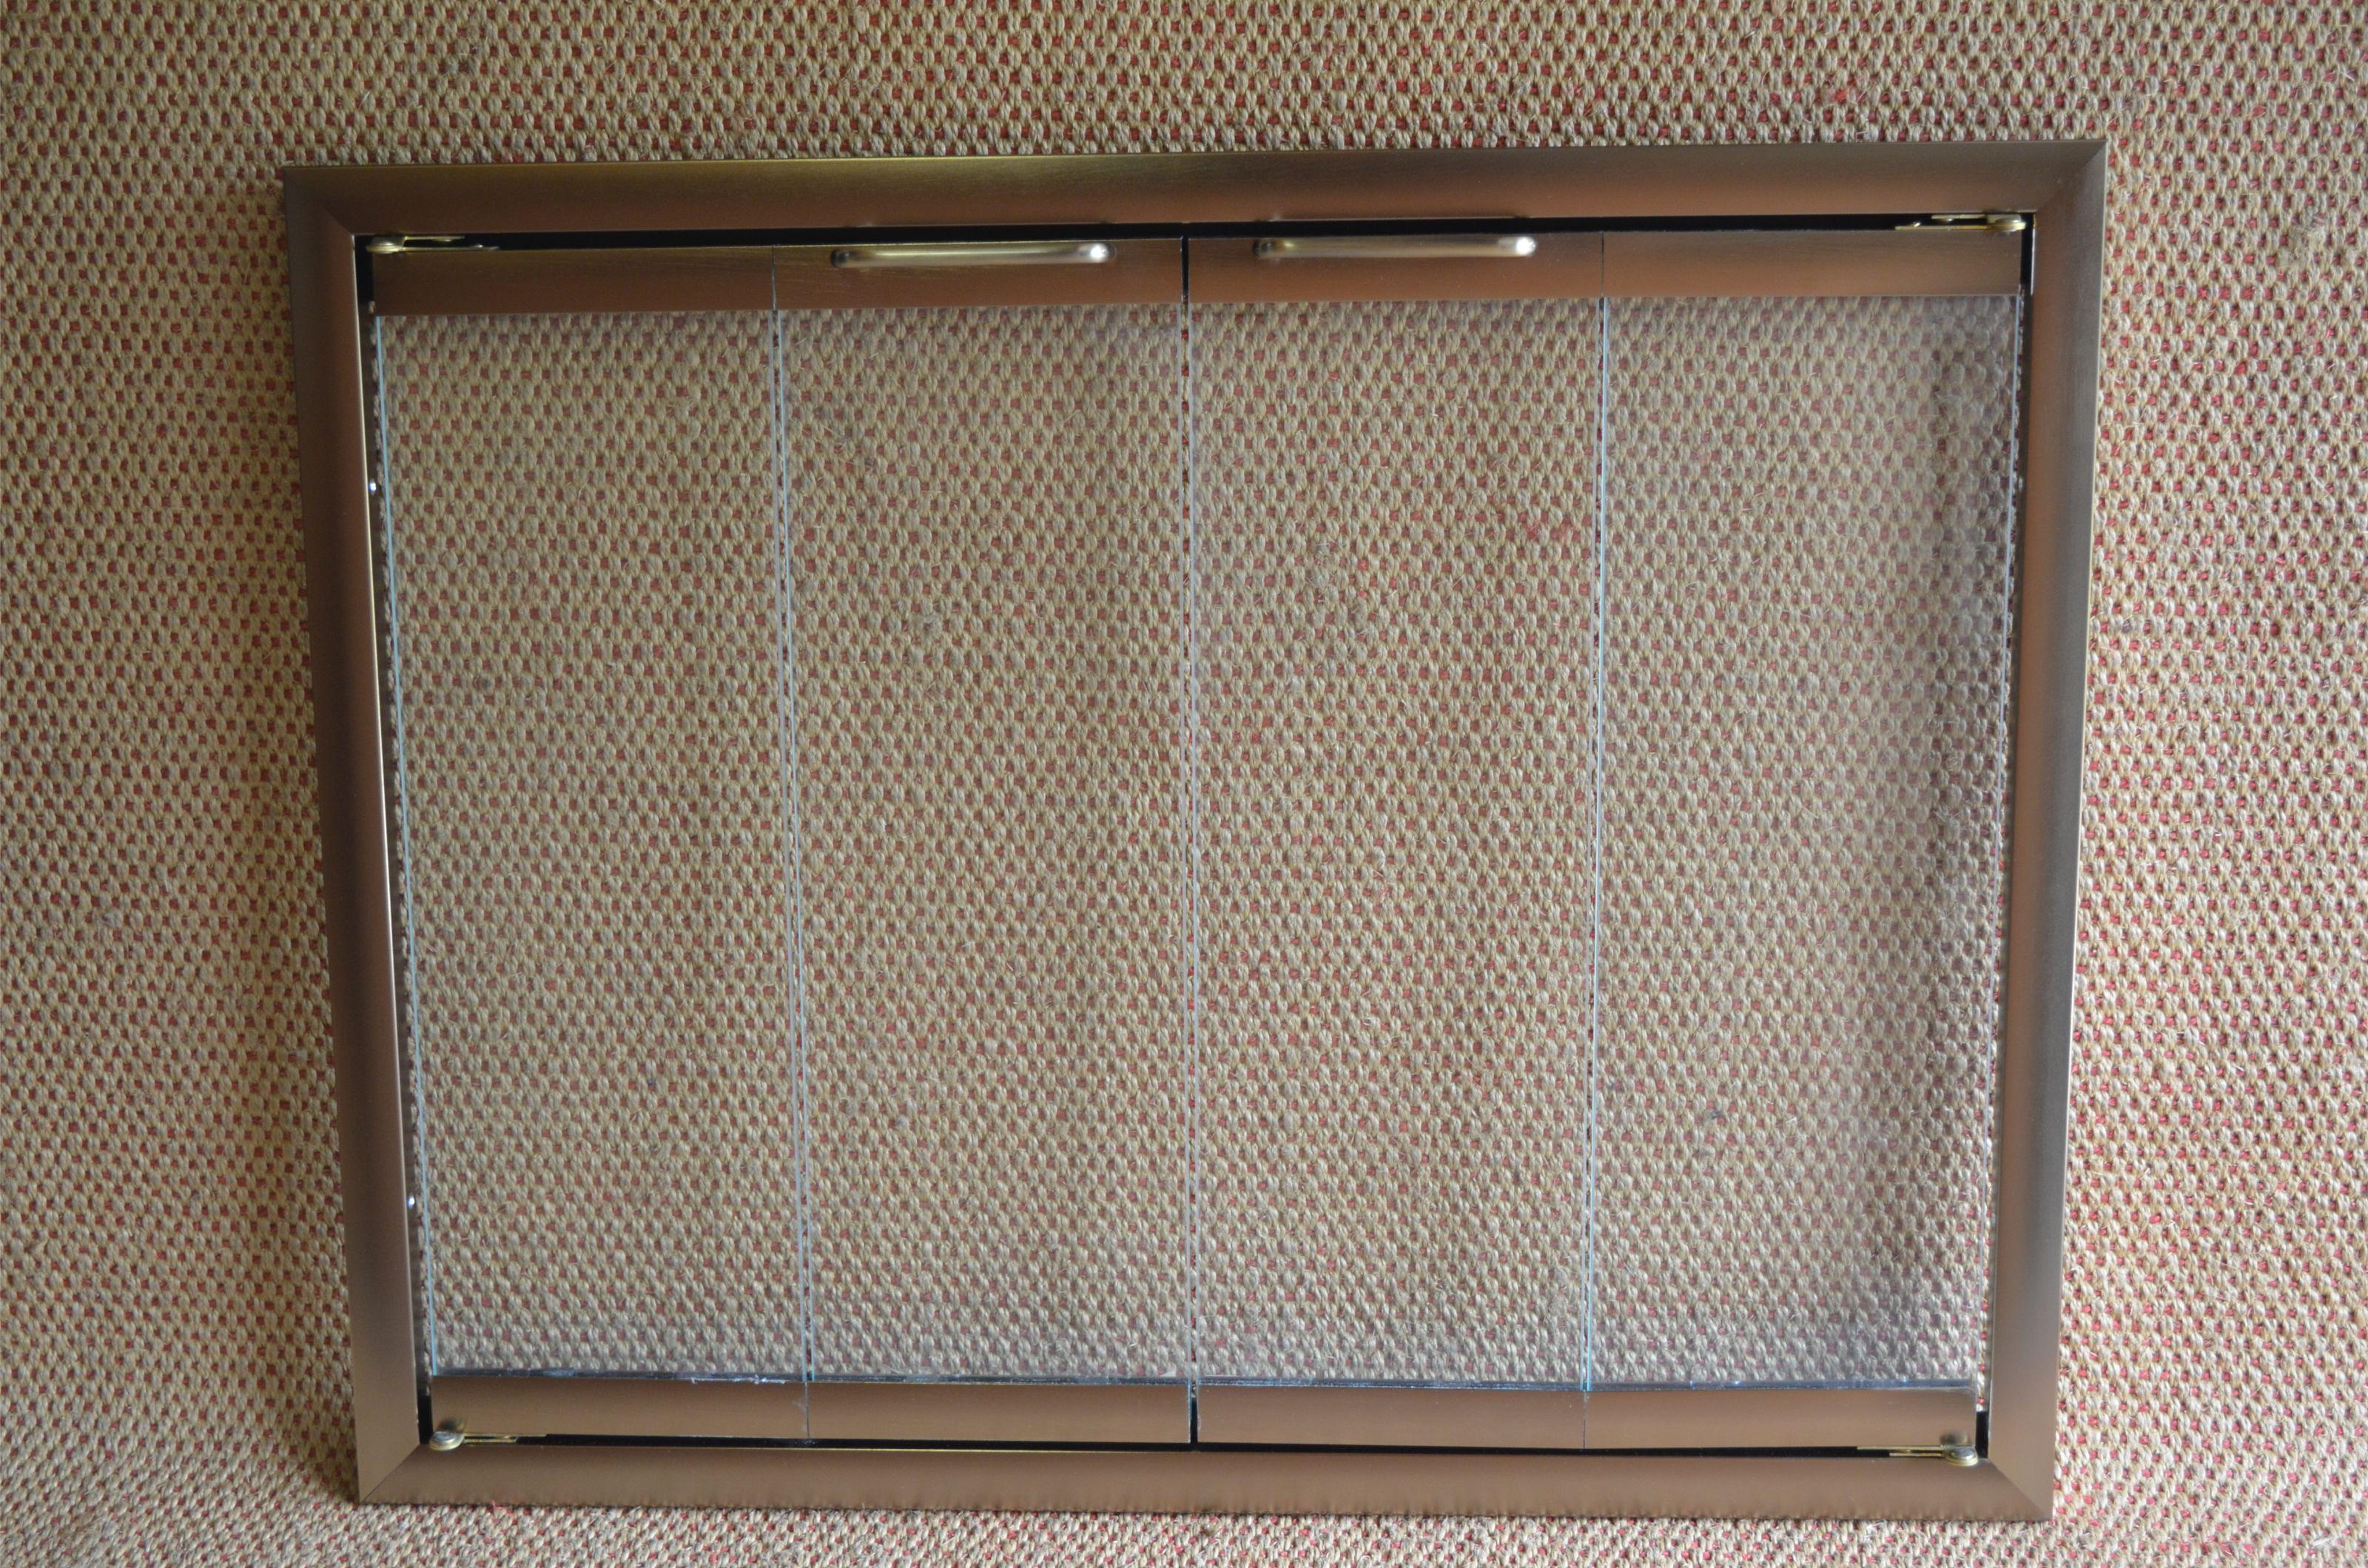 Replacement Doors Zero Clearance Fireplace Replacement Doors